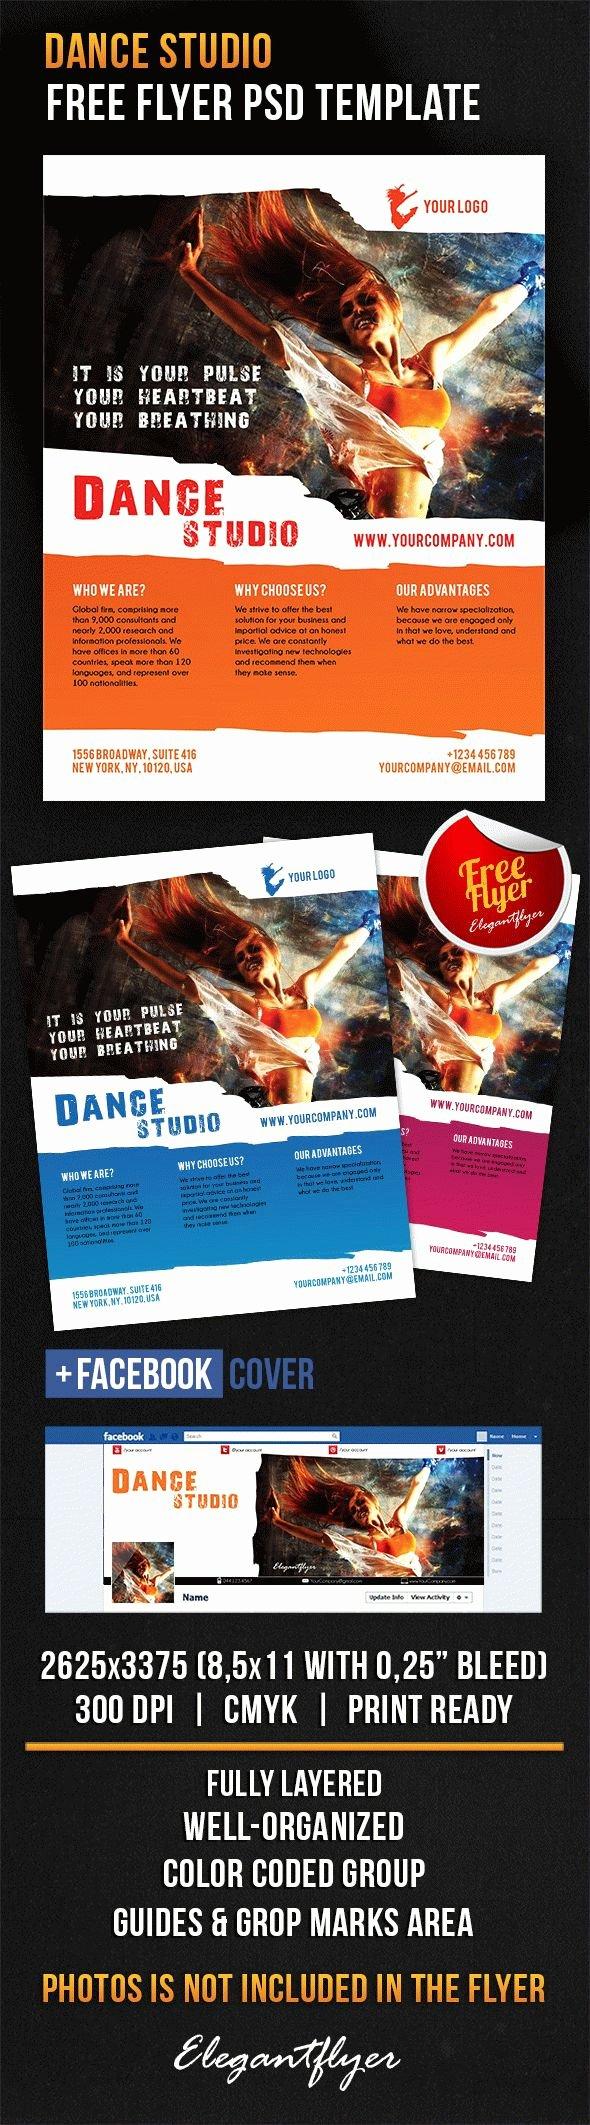 Facebook Ad Template Psd Beautiful Get Free Flyer Template Shop Dance Studio